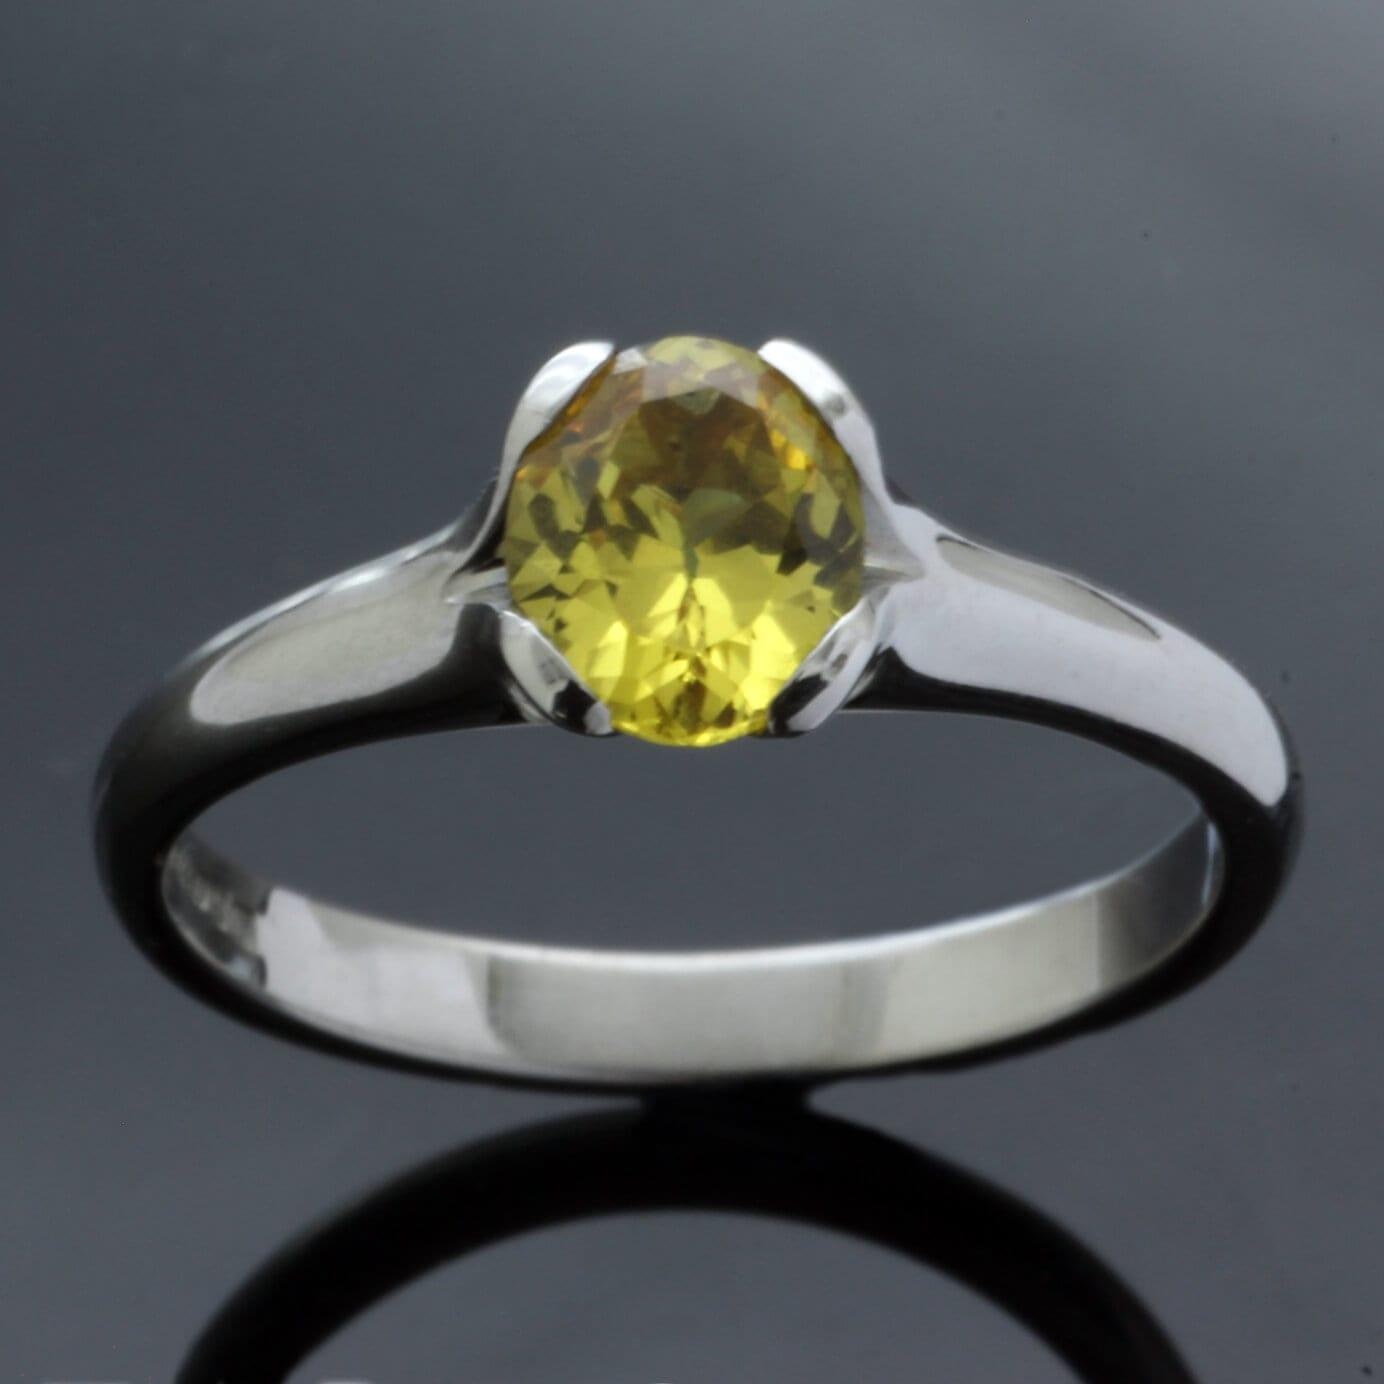 Chrysoberyl gemstone engagement ring set in solid Palladium by Julian Stephens